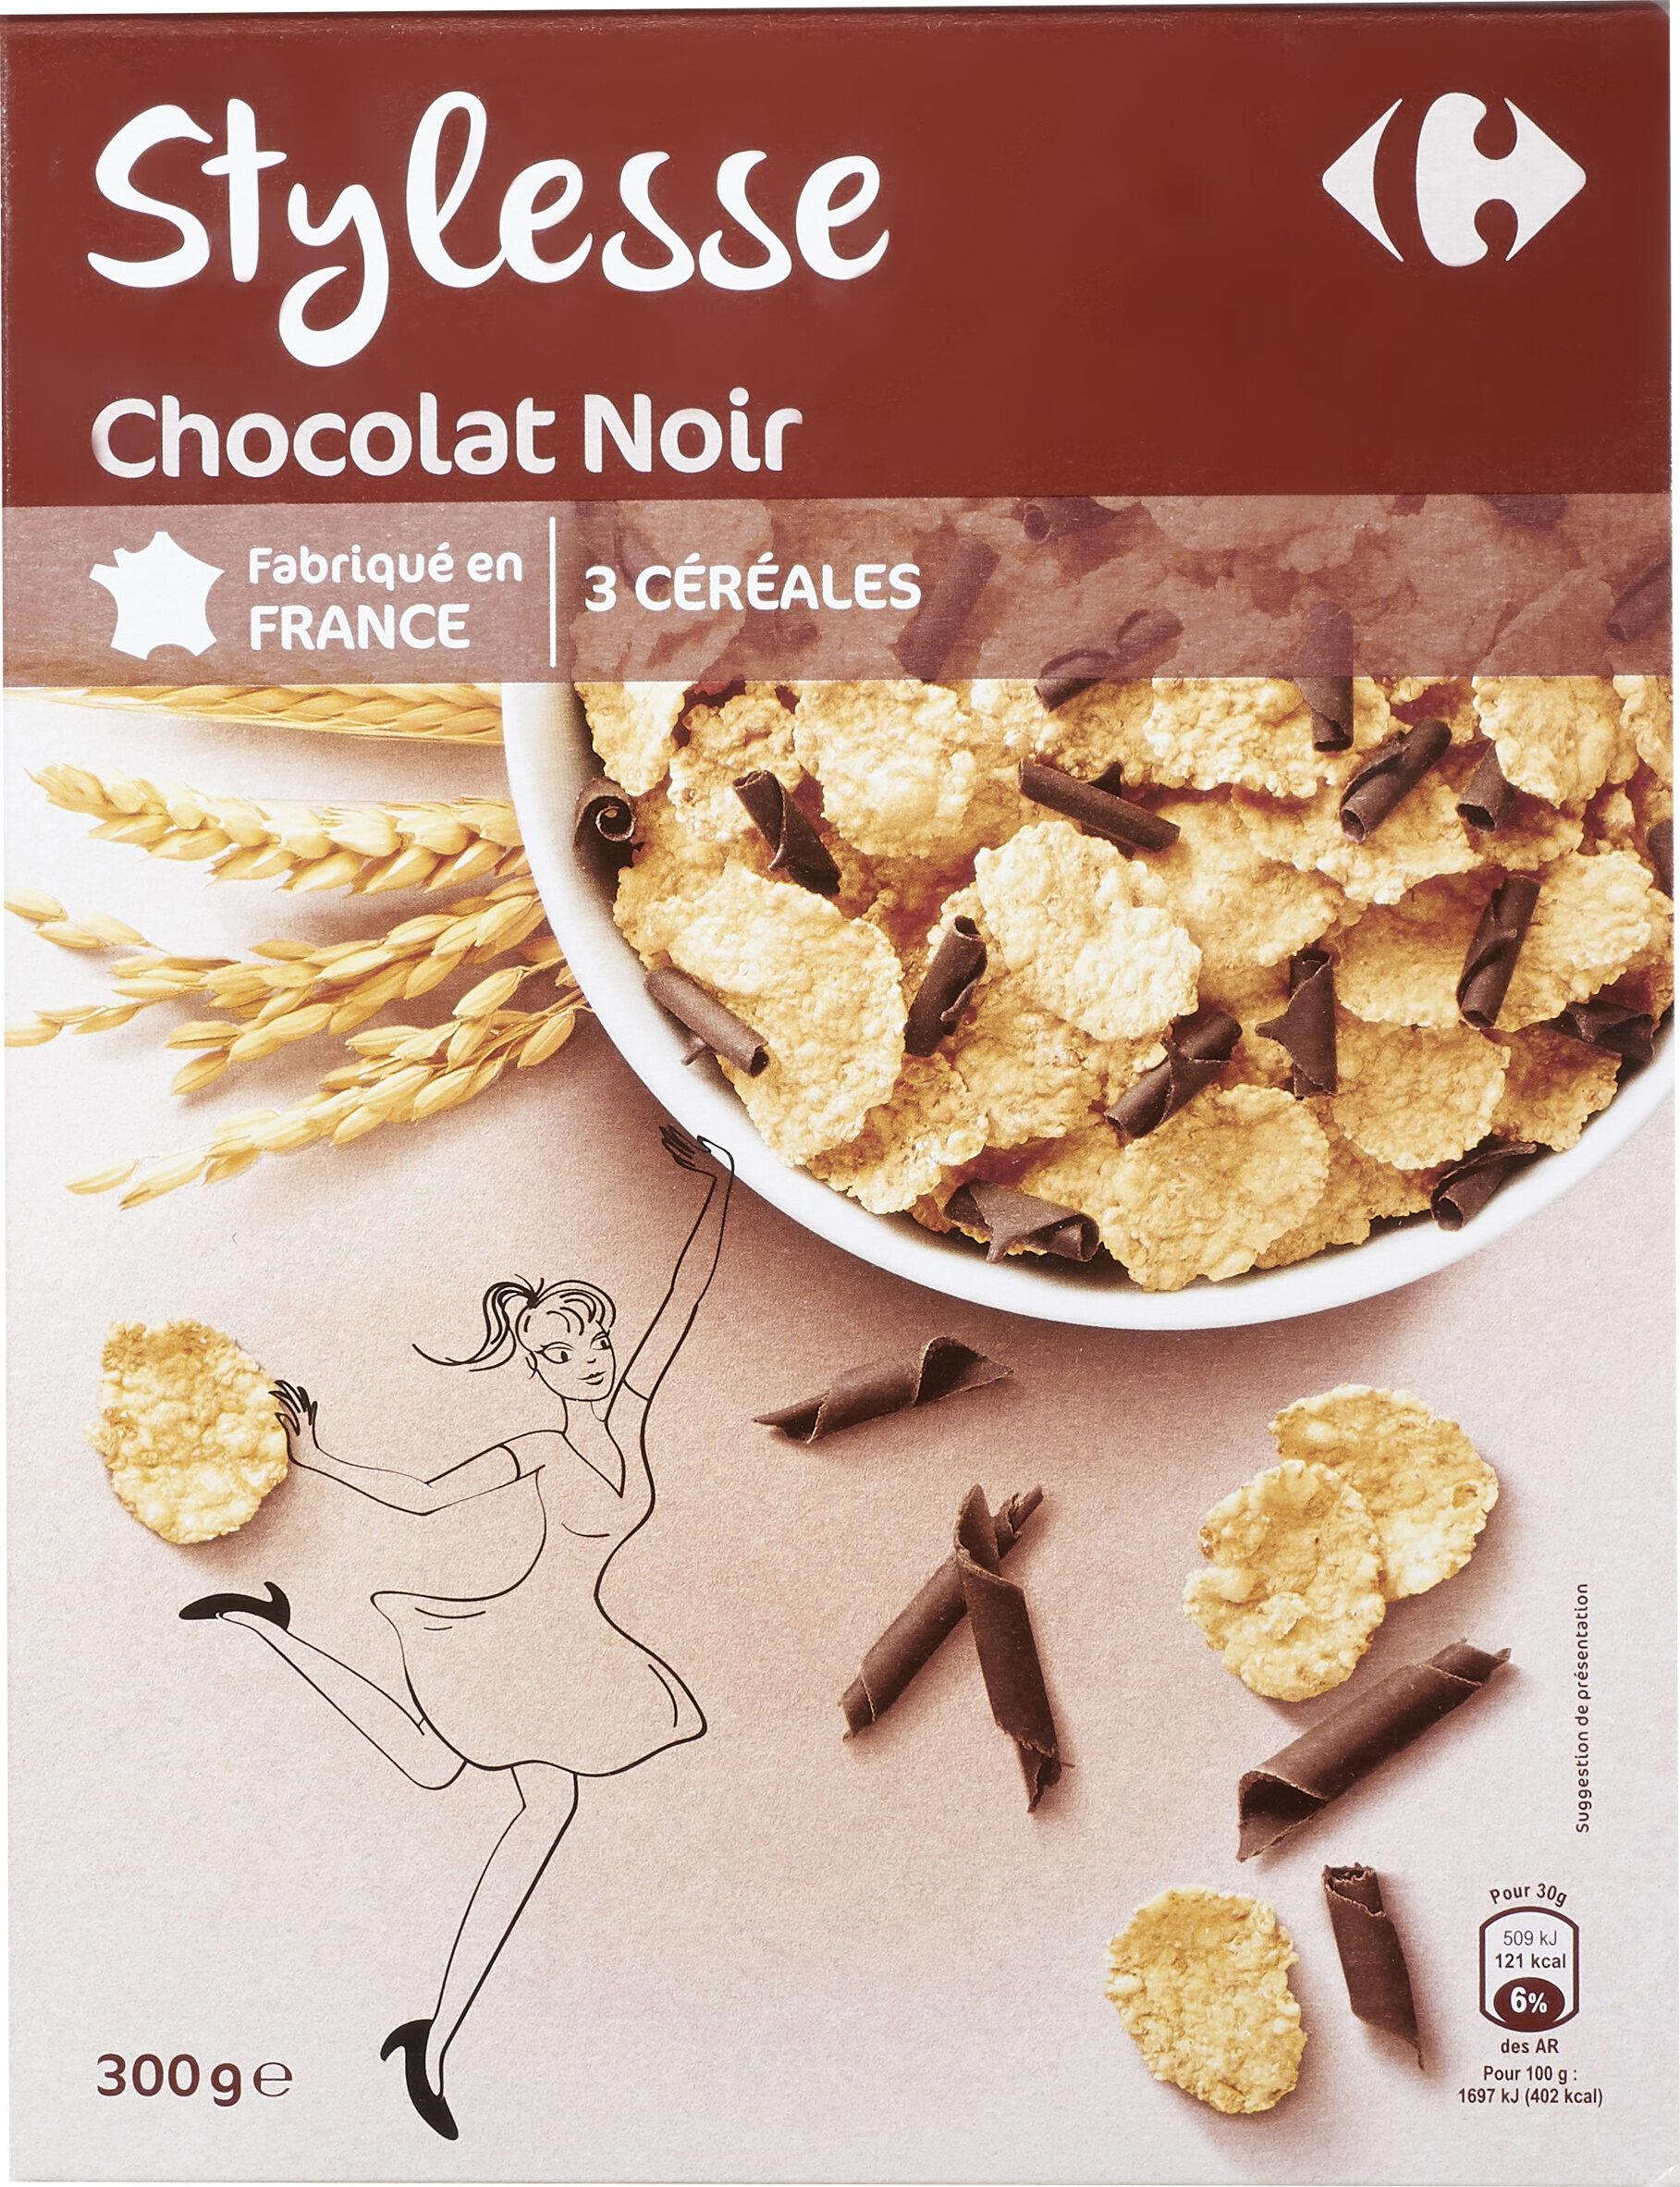 Stylesse Chocolat Noir - Product - fr